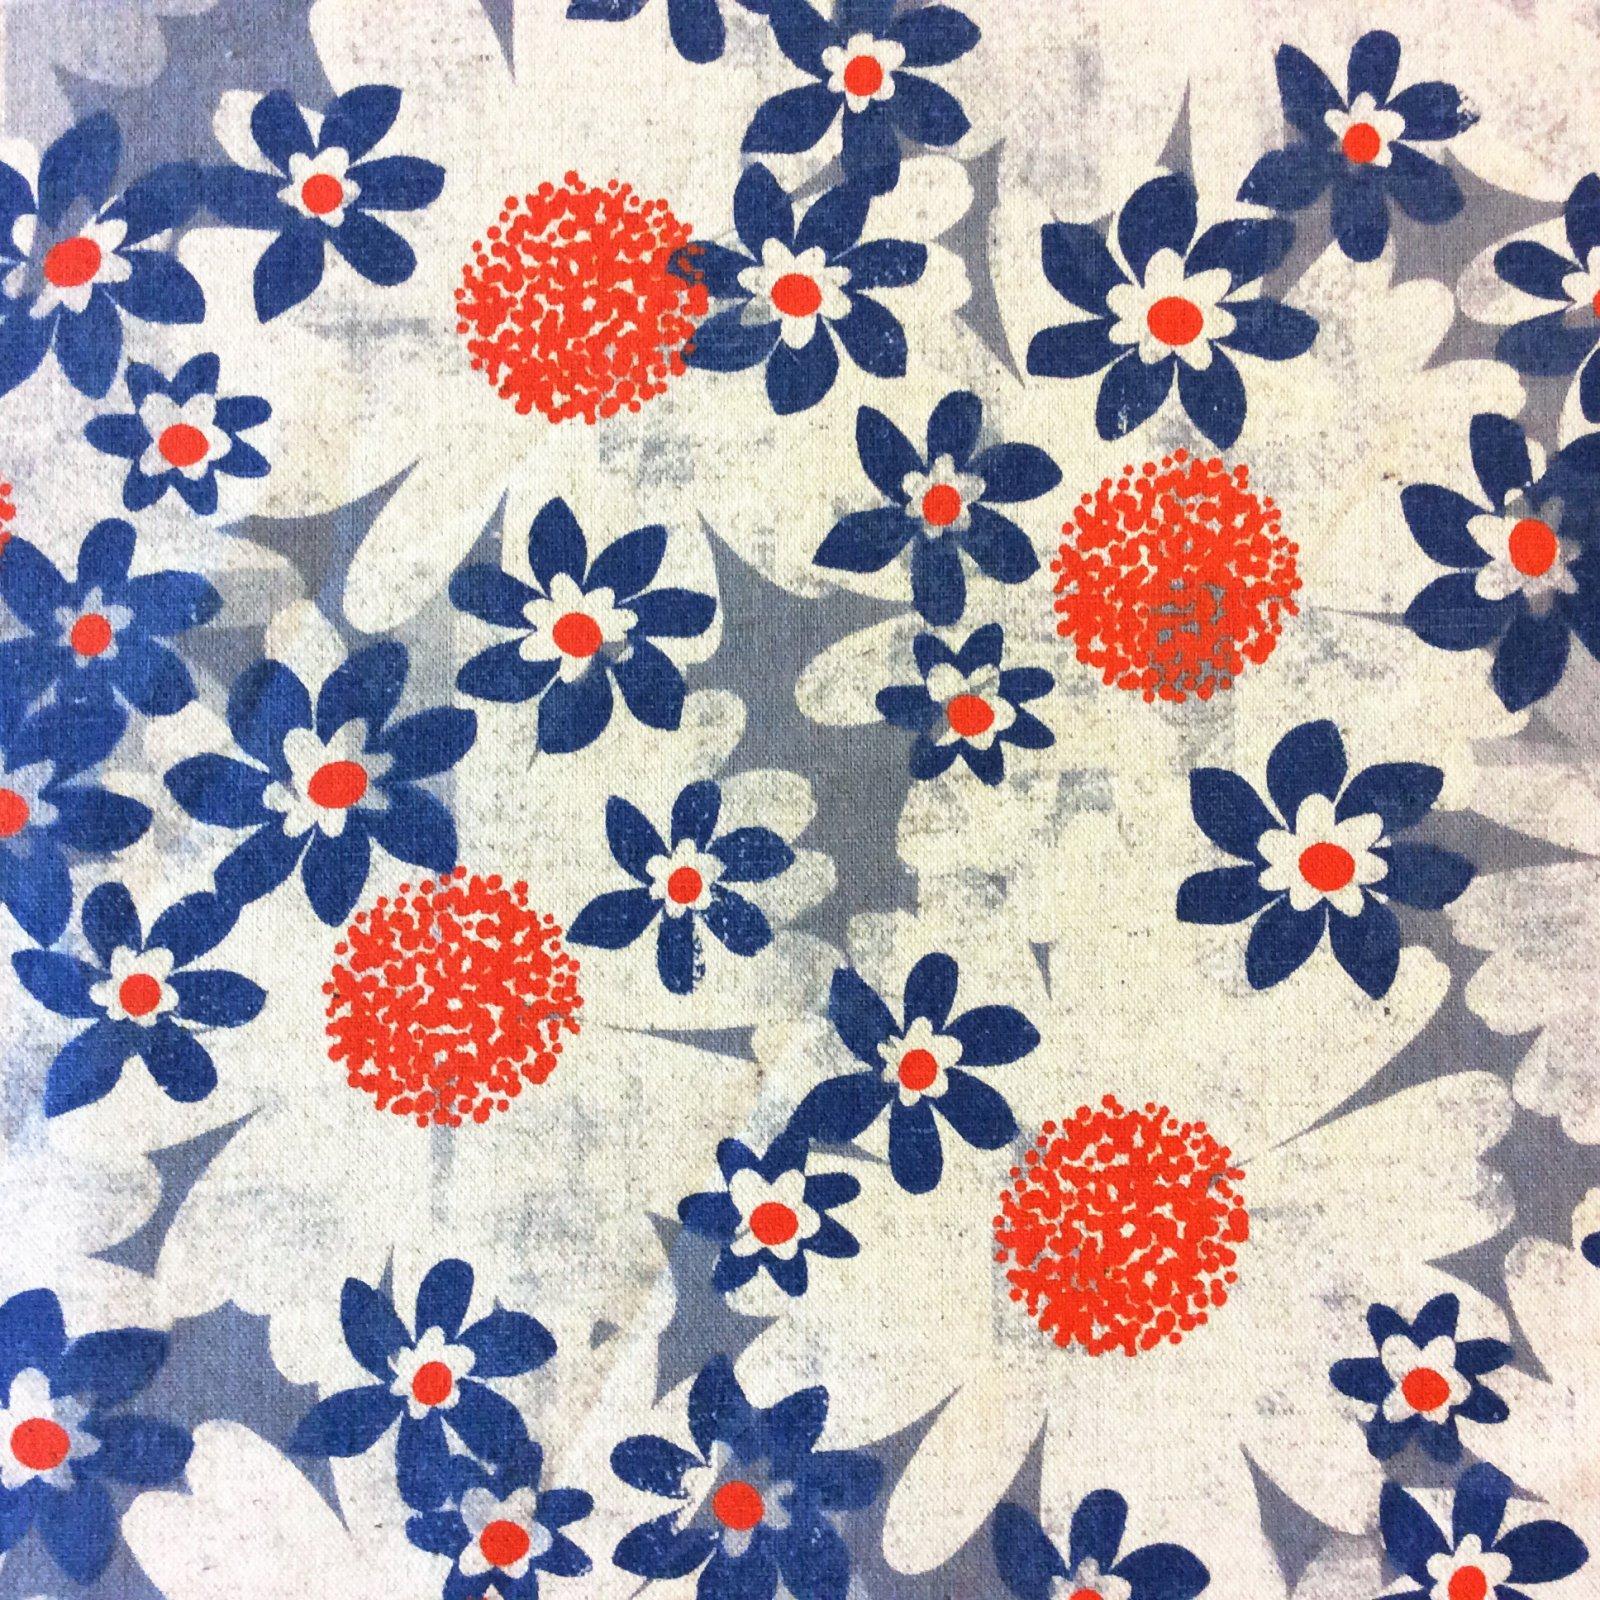 CTN72 Cotton + Steel July Daisy Canvas Floral Garden Flower Cotton Quilt Fabric